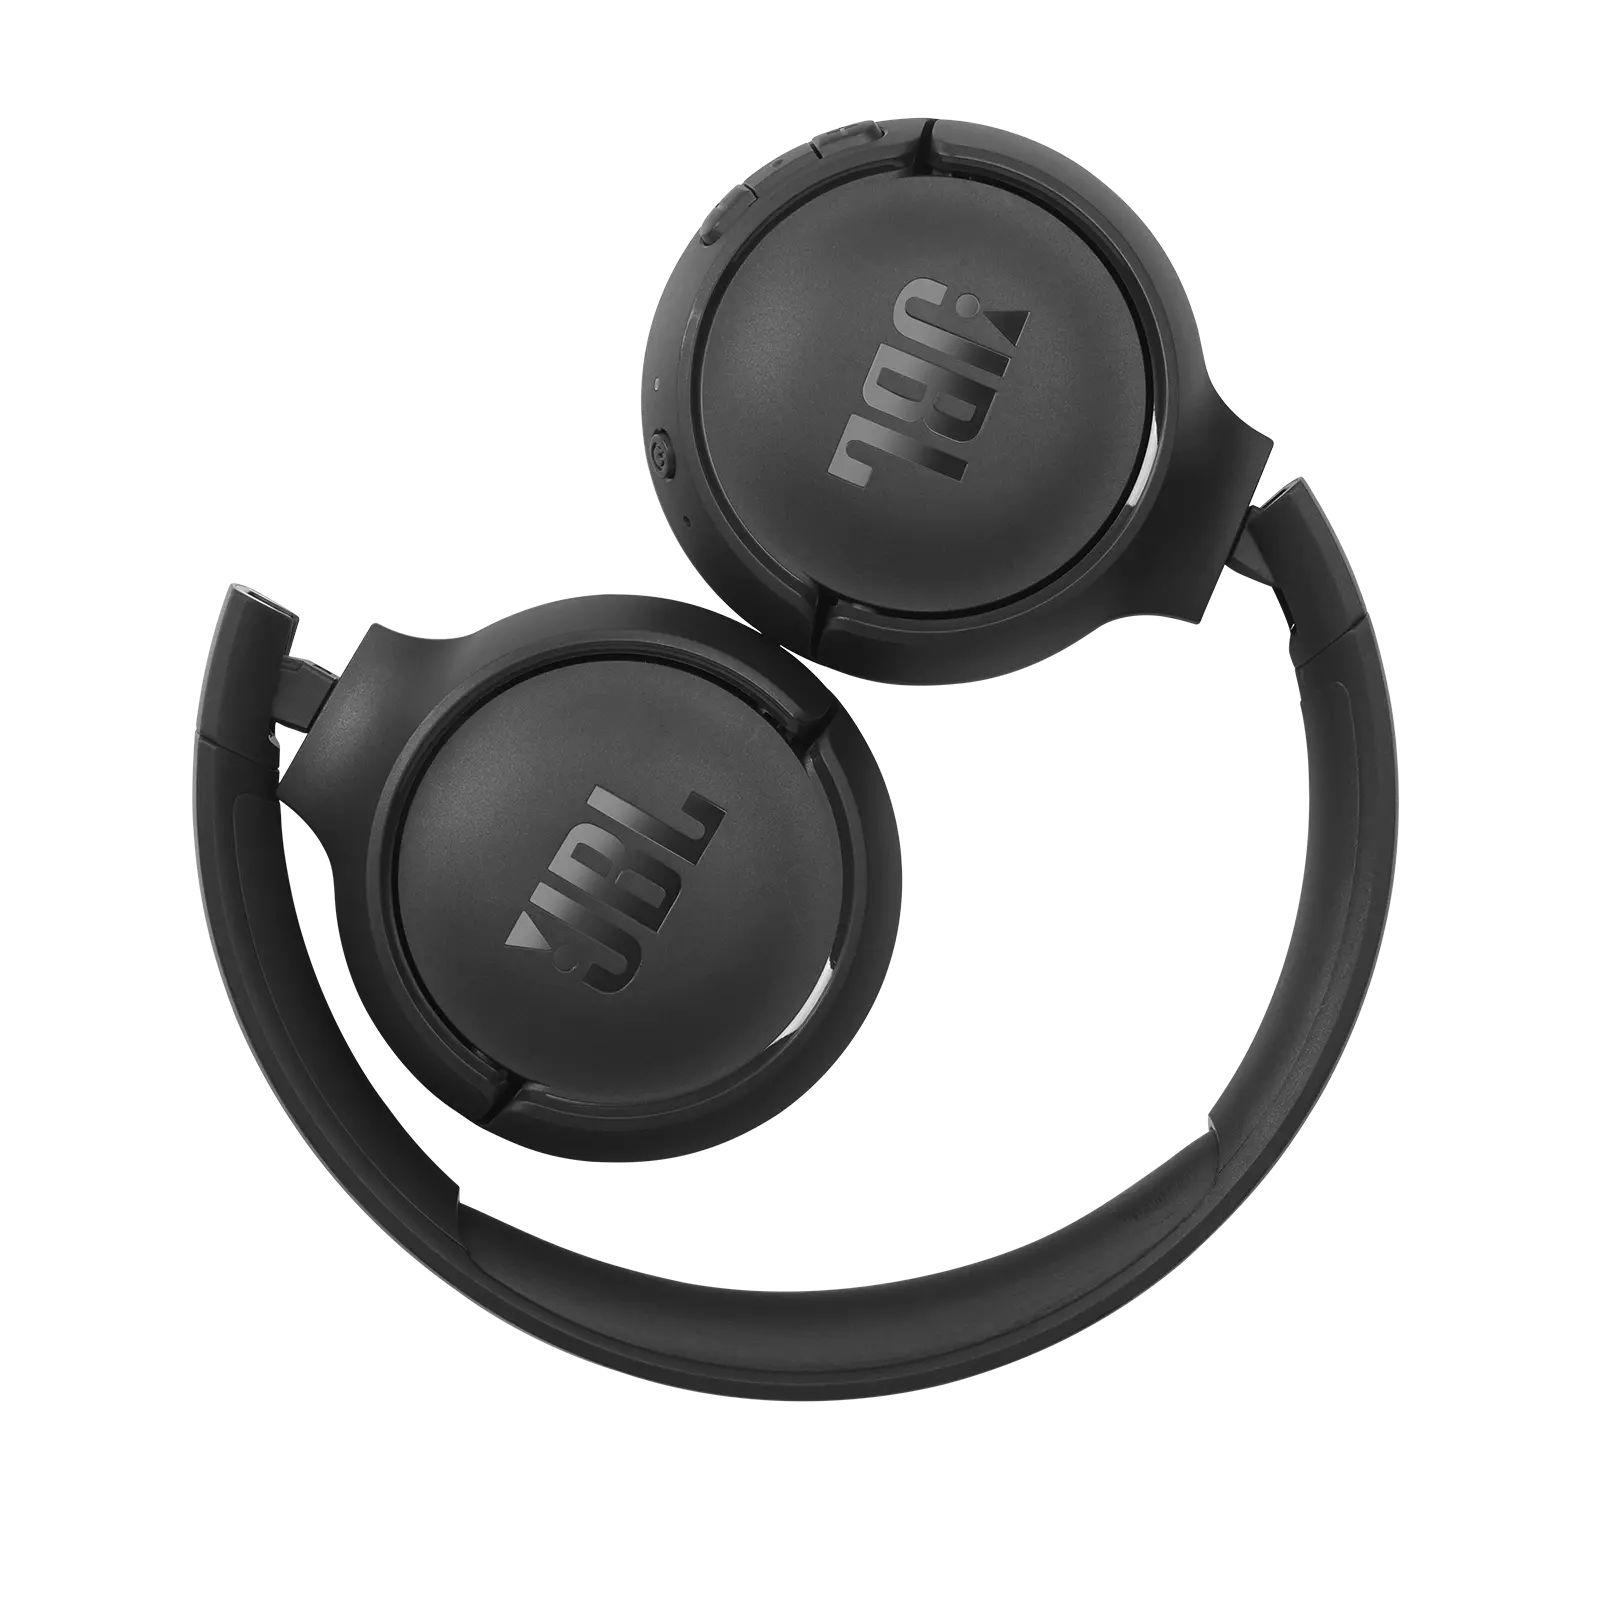 Fone de Ouvido Bluetooth JBL Tune 510BT - Preto JBLT510BTBLK